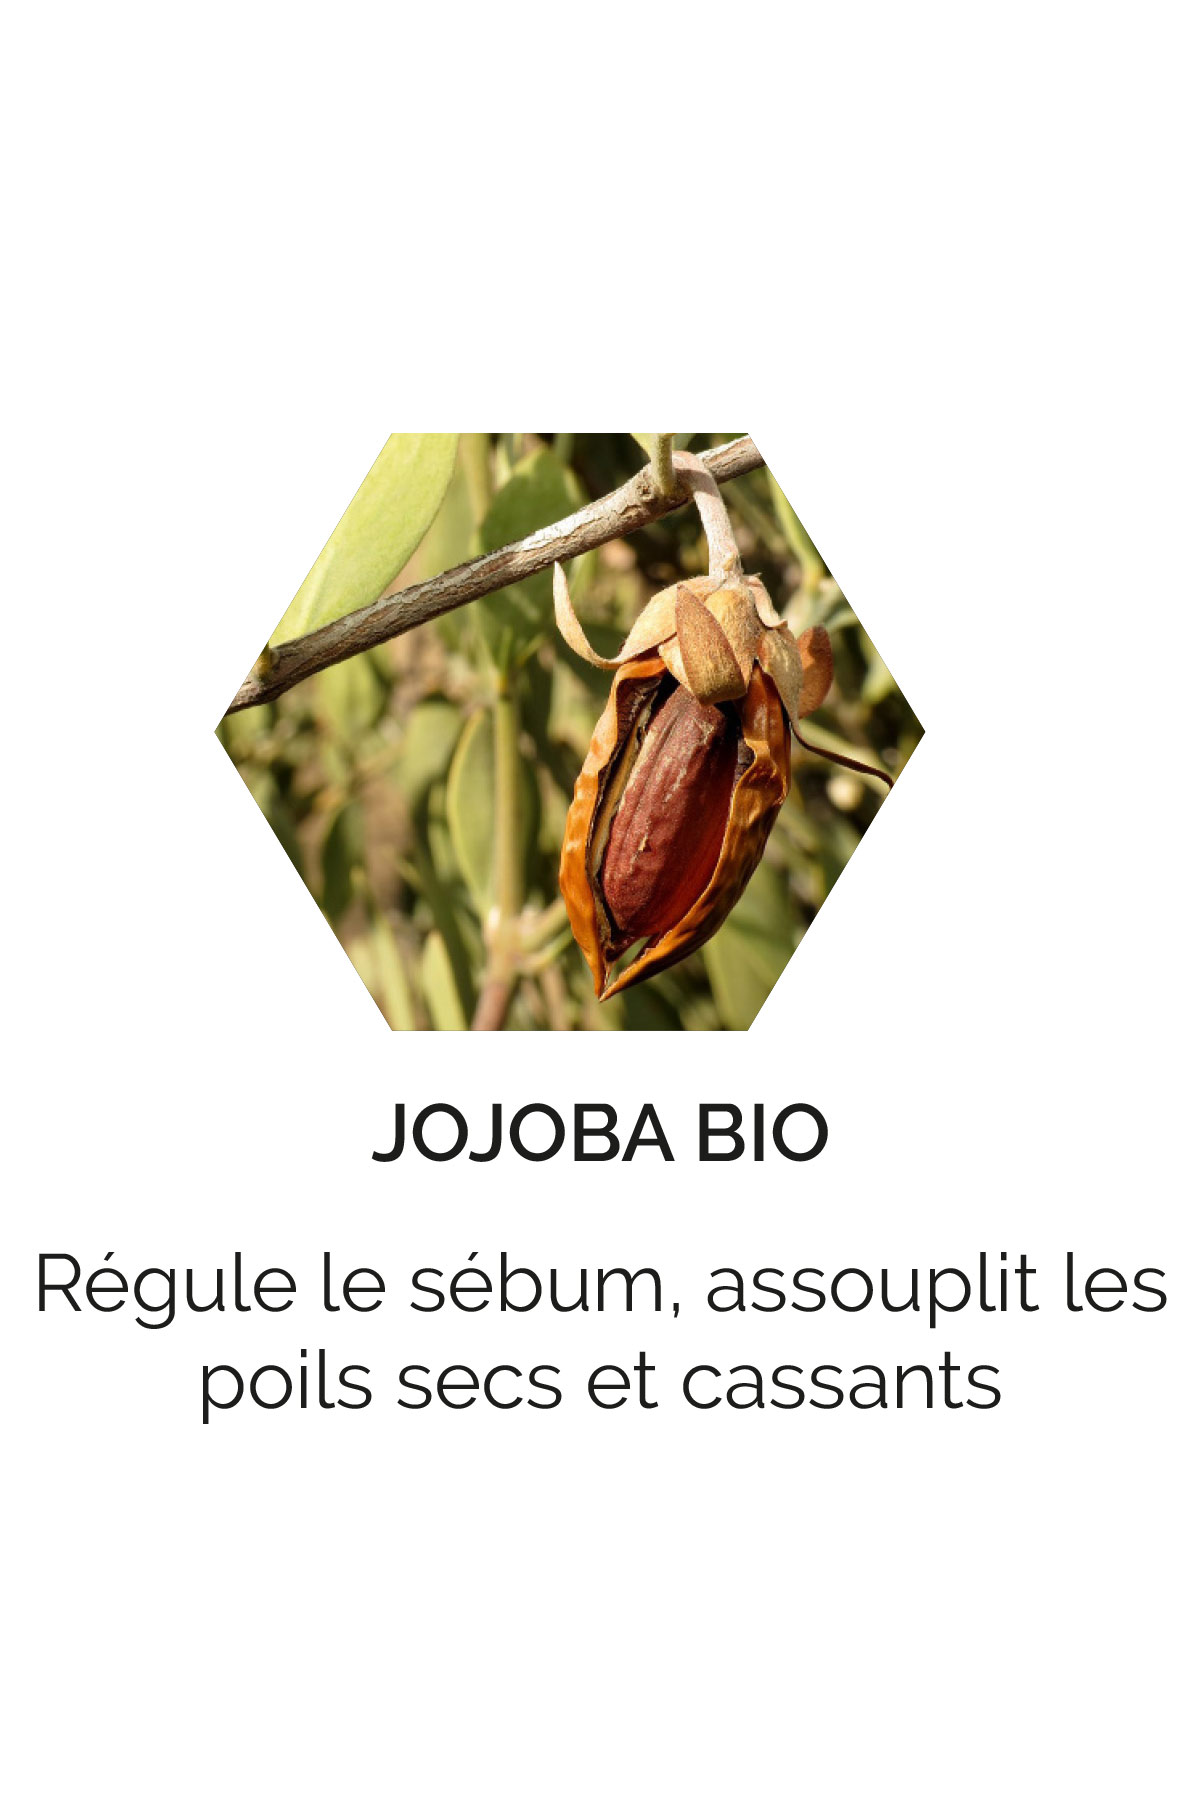 Jojoba bio